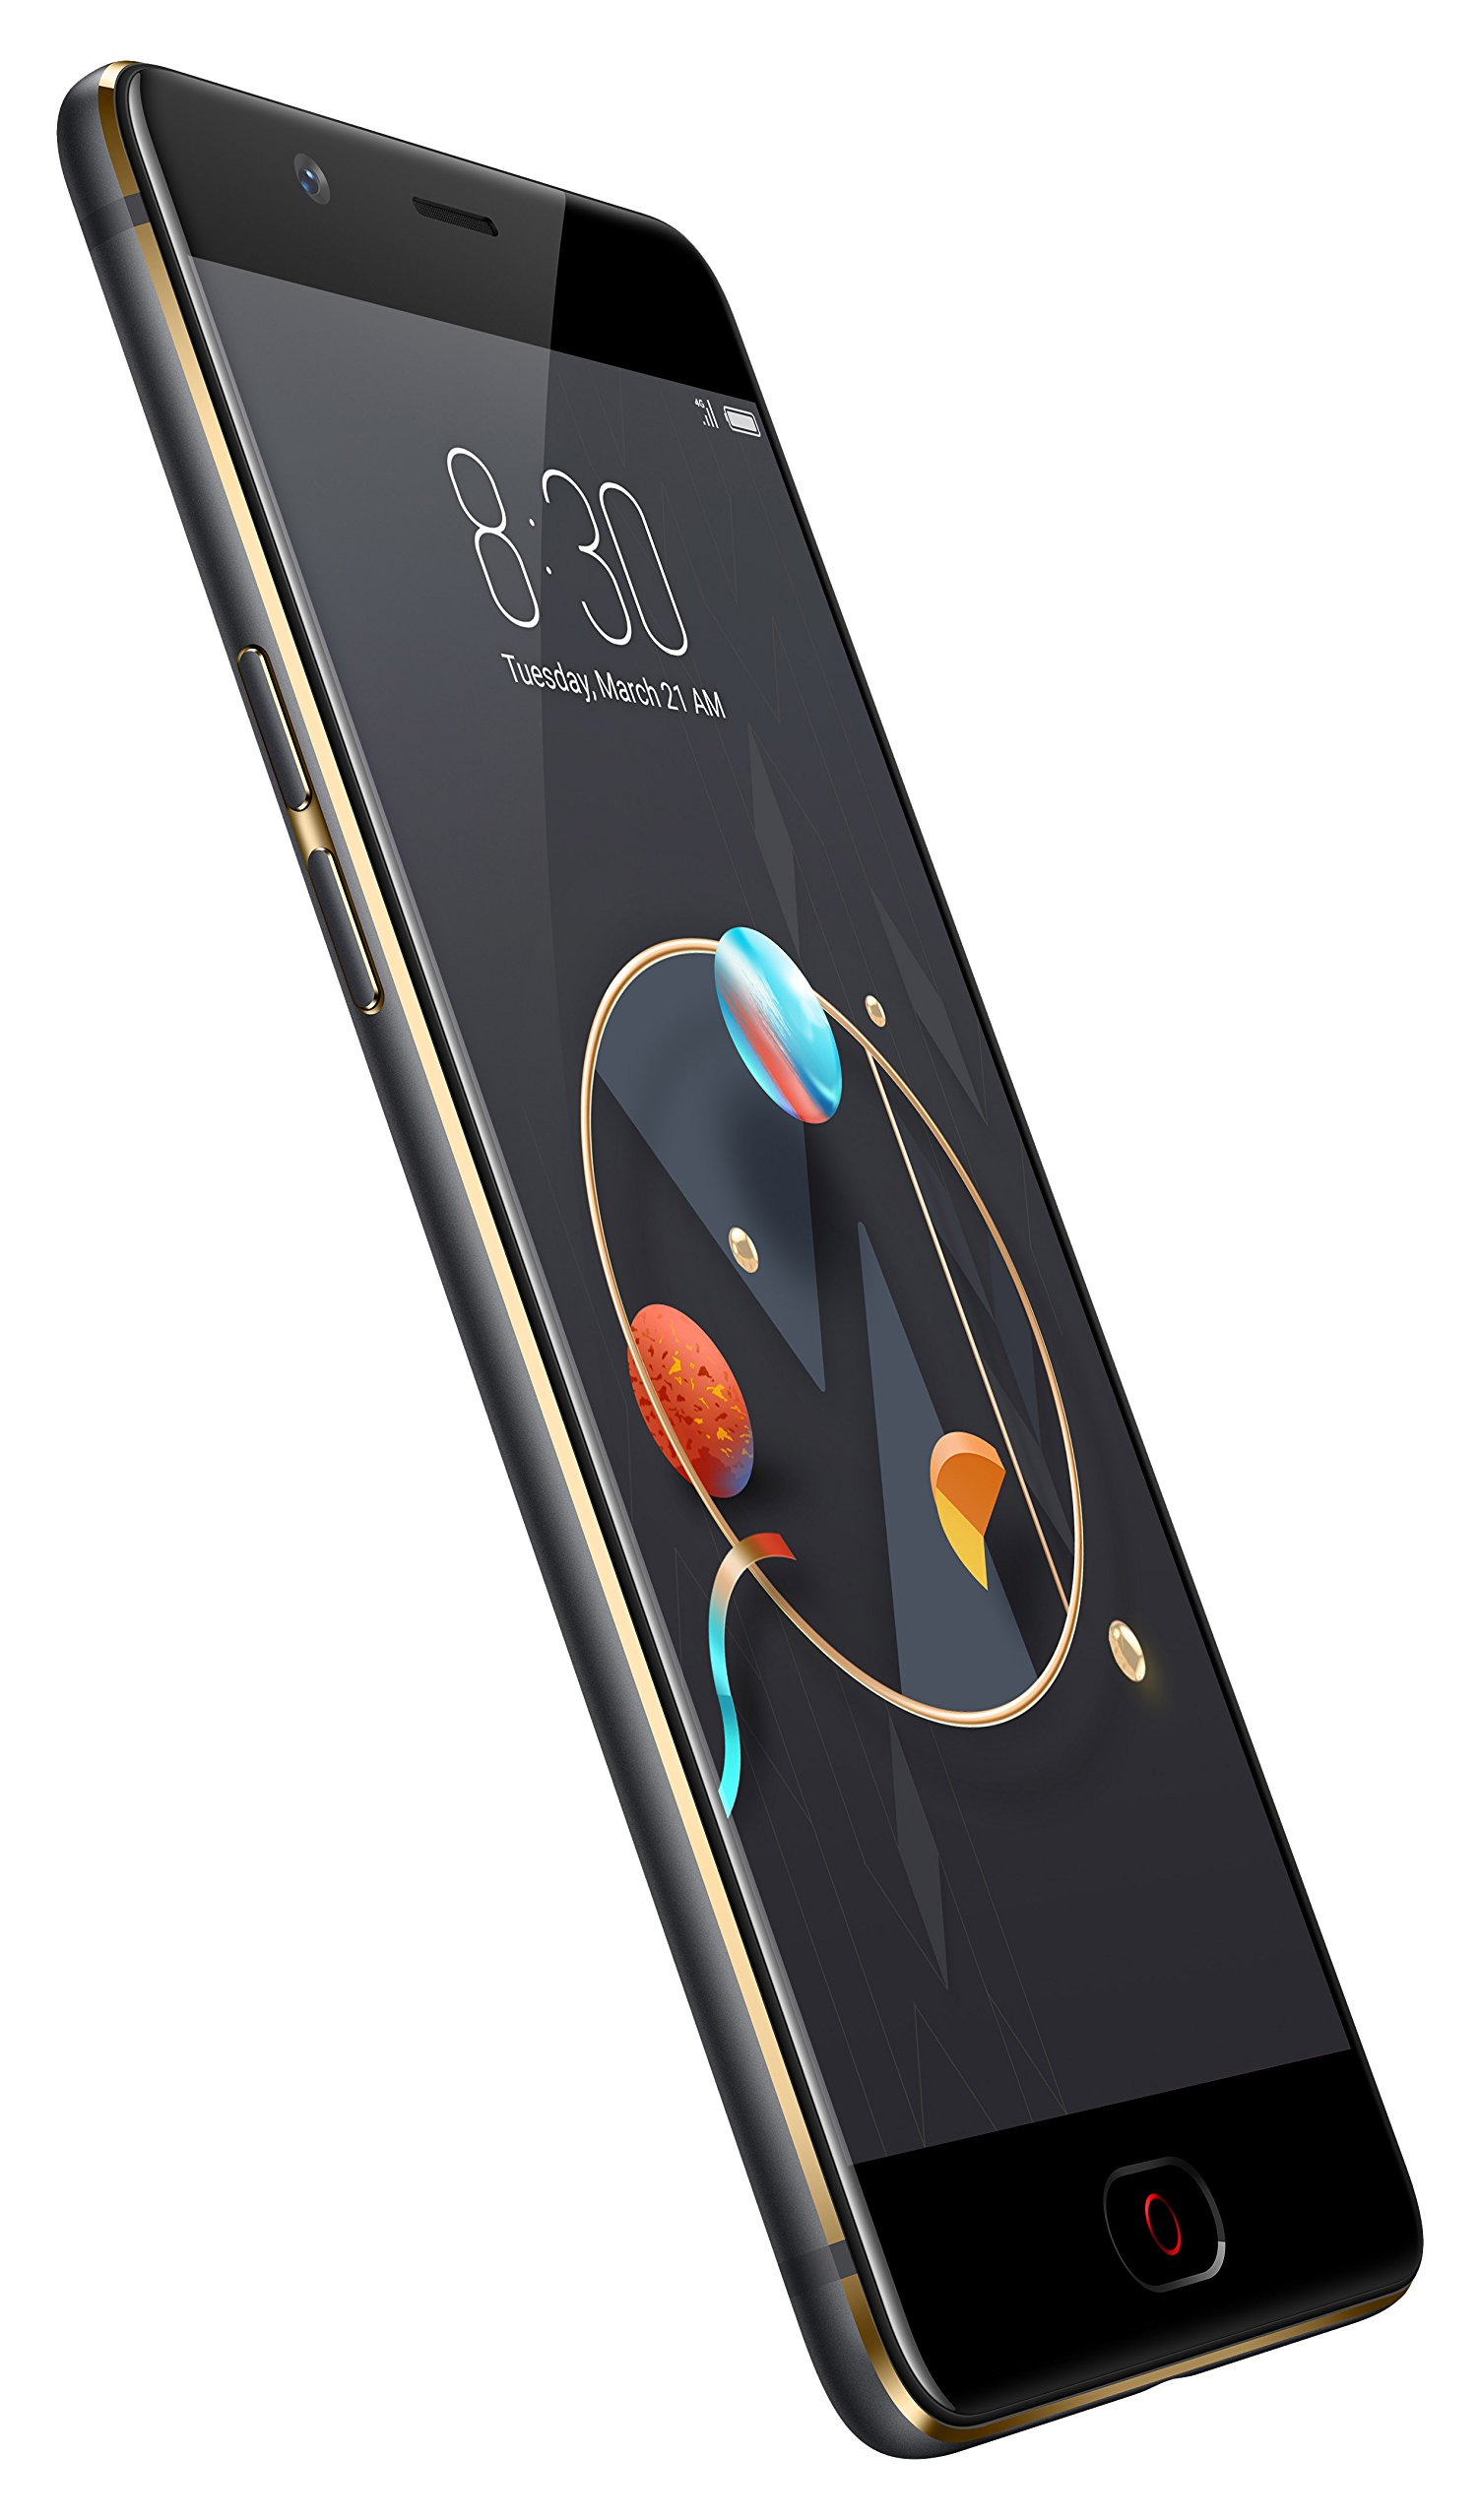 Nubia nx551j M2 Smartphone (64GB Memoria, 4 GB de RAM, cámara de ...